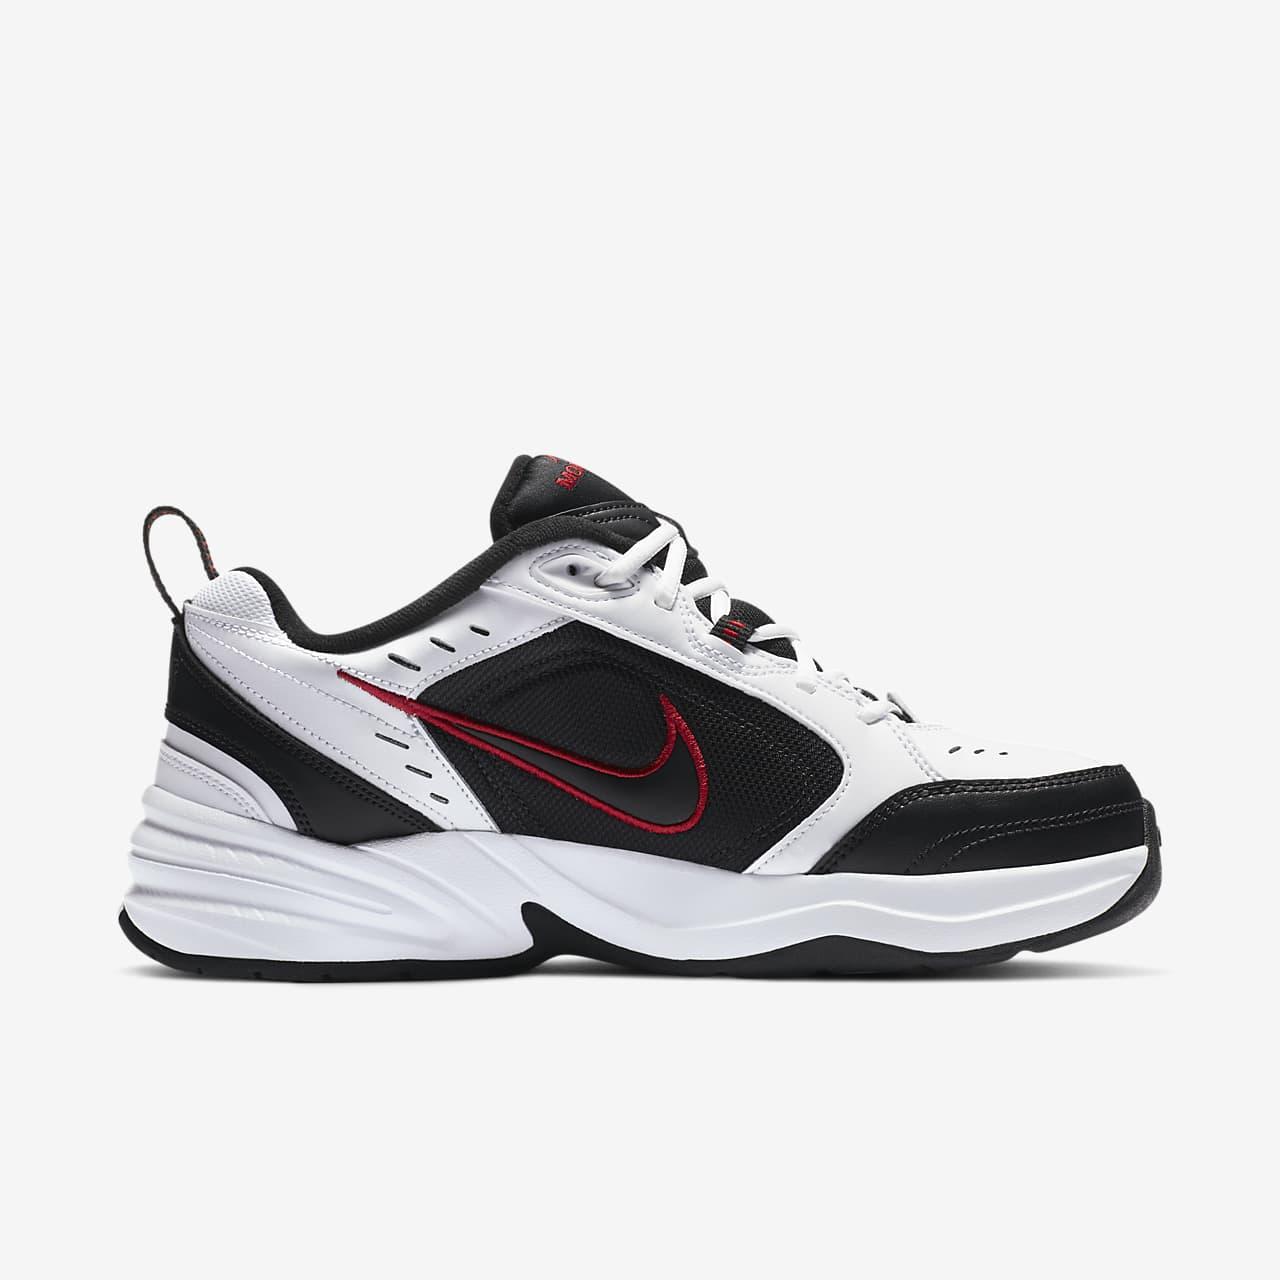 timeless design 16a62 3bd61 ... Nike Air Monarch IV Schuh für Lifestyle Fitnessstudio